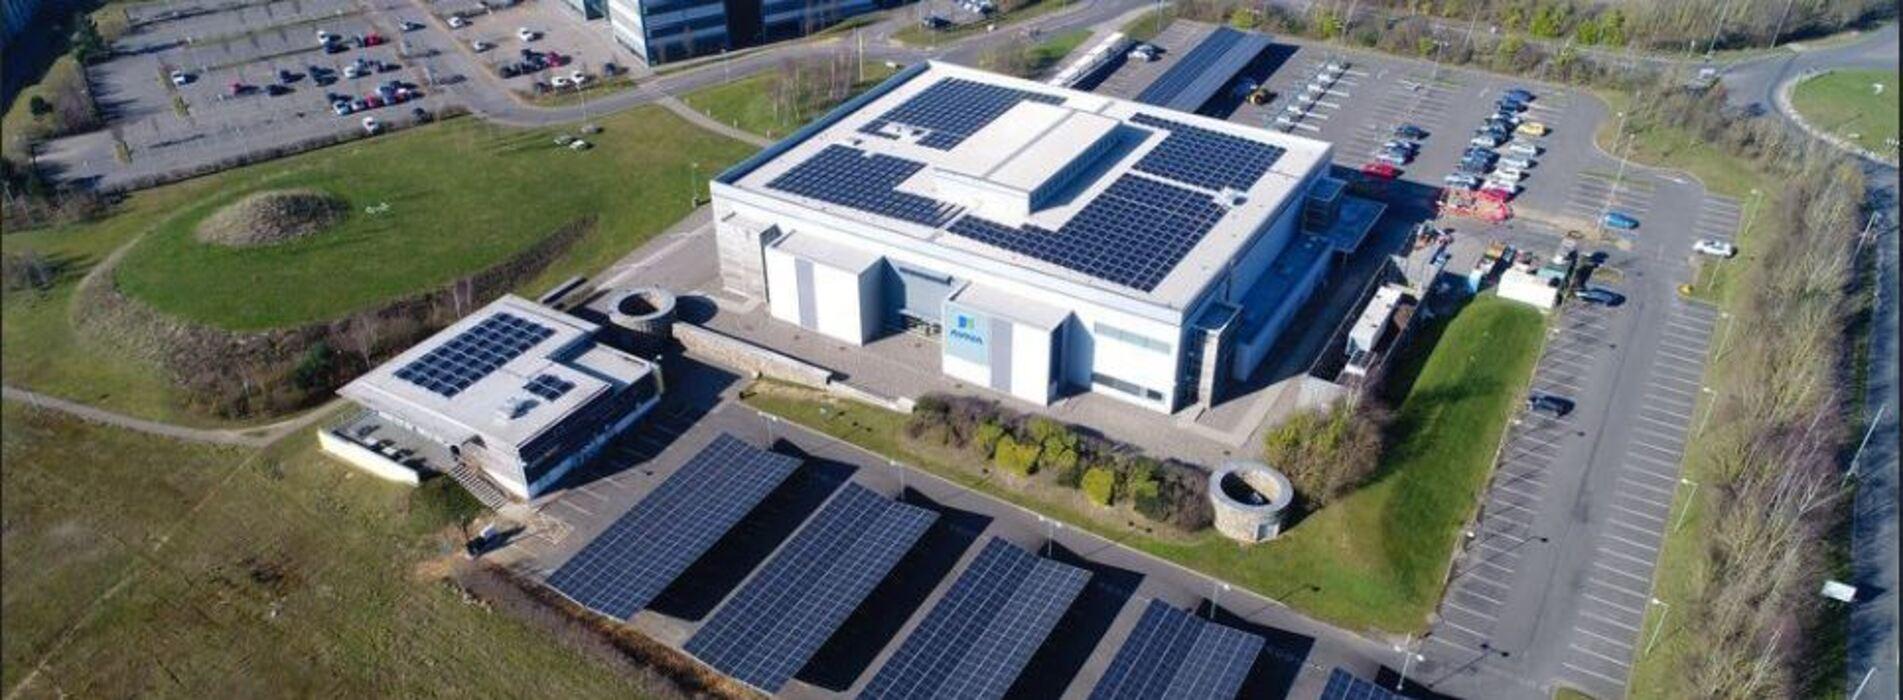 Solar car ports, Aviva Norwich, Ground anchors